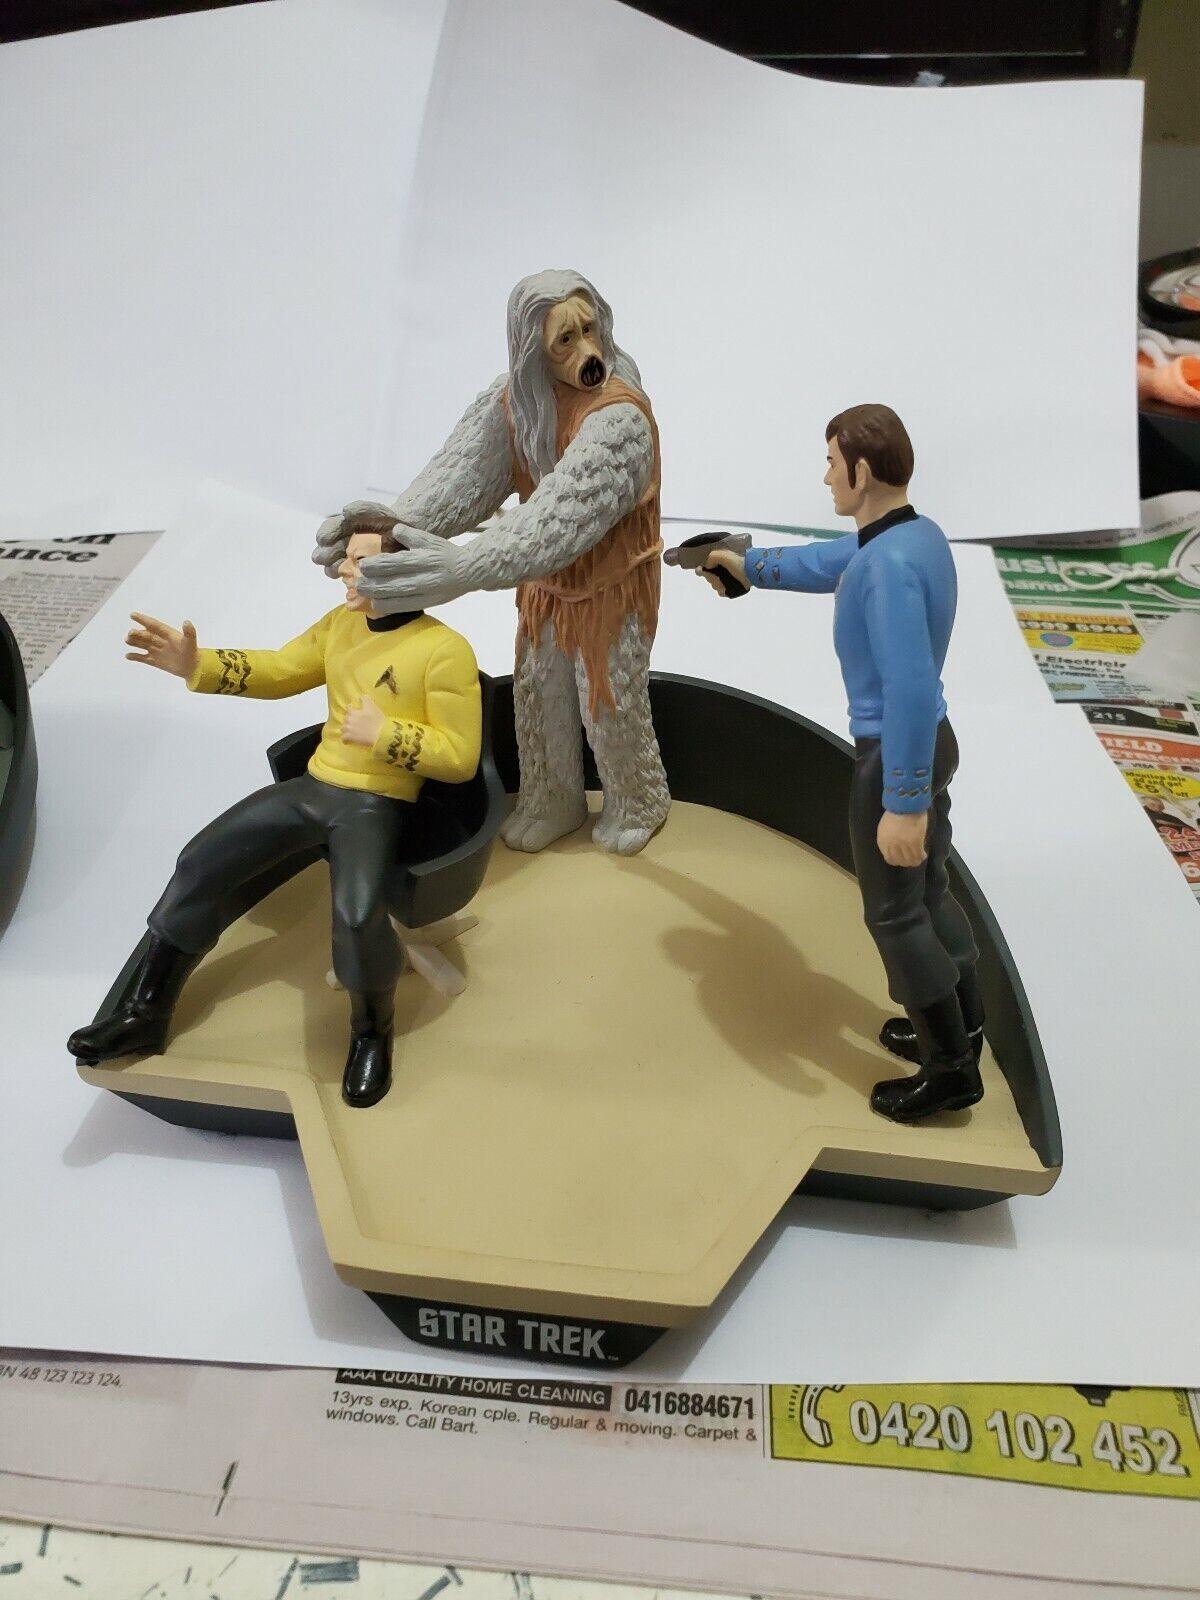 Star Trek Diorama M-113 Salt Creature by Applause Kirk  & McCoy Ltd Ed.  économiser jusqu'à 50%